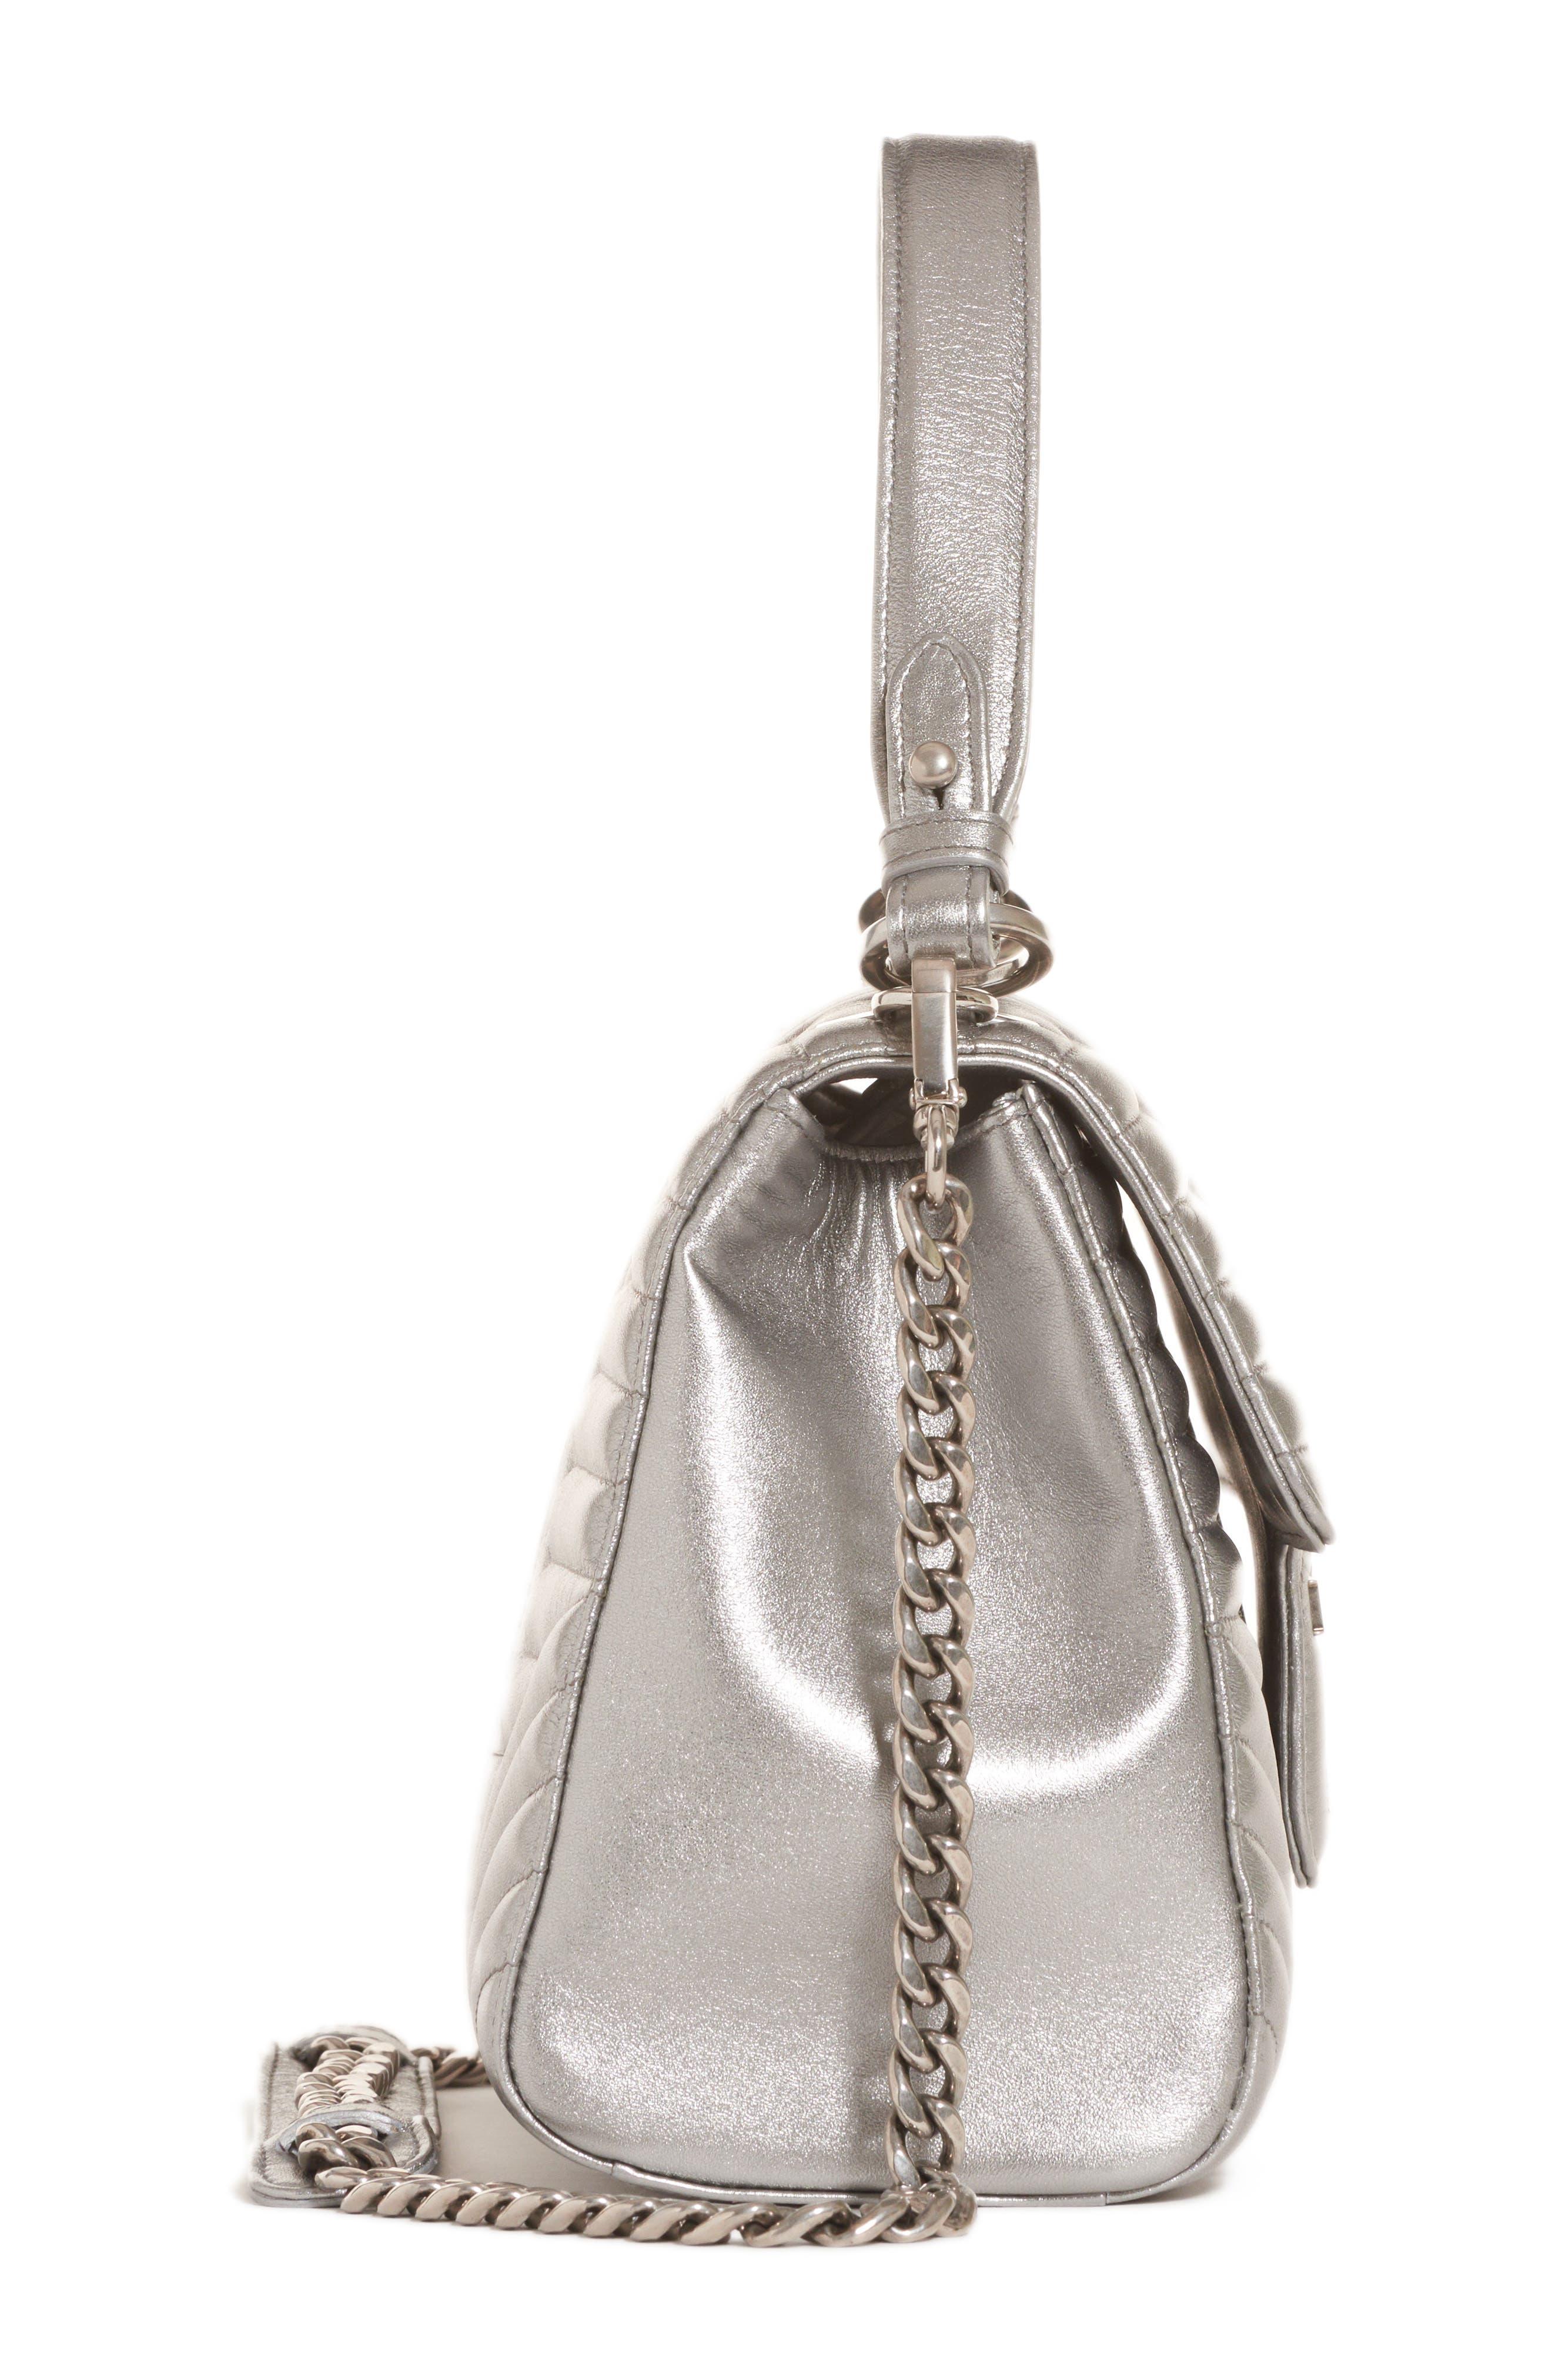 Quilted Metallic Lambskin Leather Handbag,                             Alternate thumbnail 4, color,                             CROMO